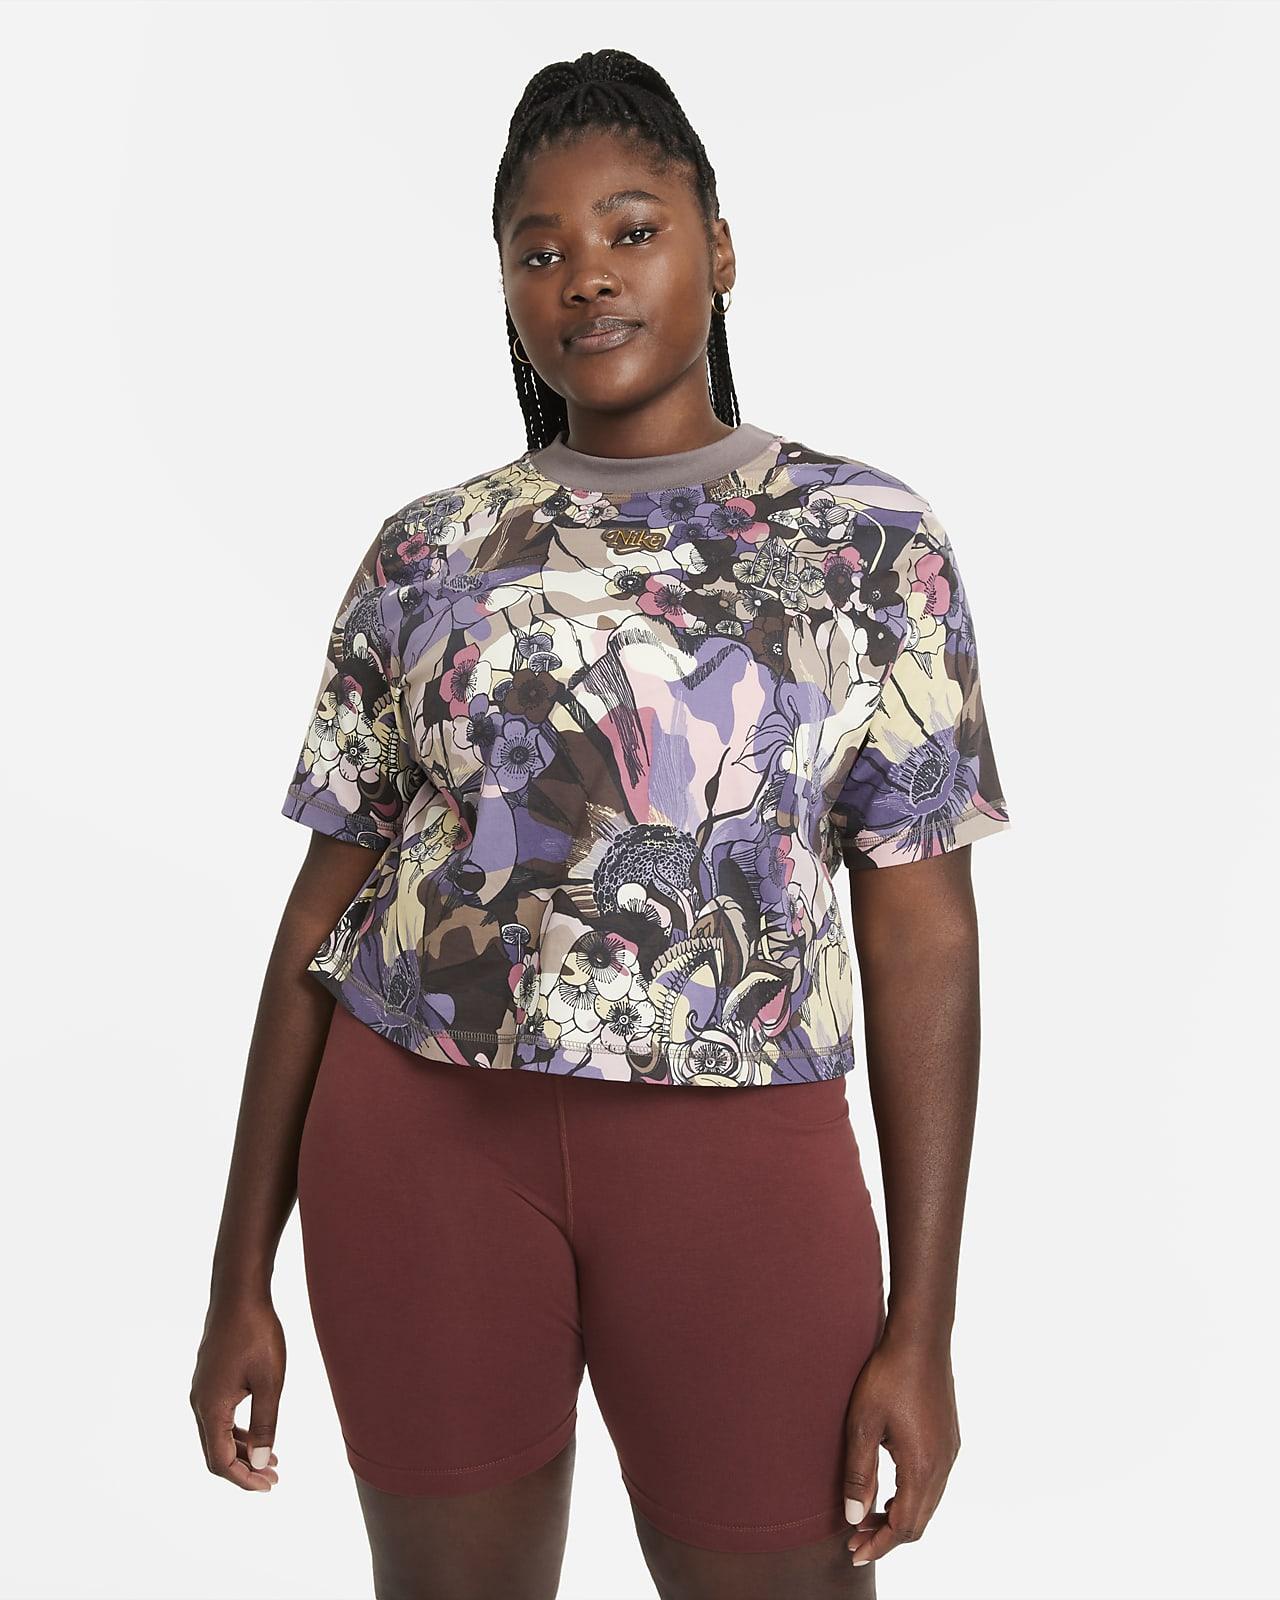 Camiseta de manga corta para mujer Nike Sportswear Femme (talla grande)